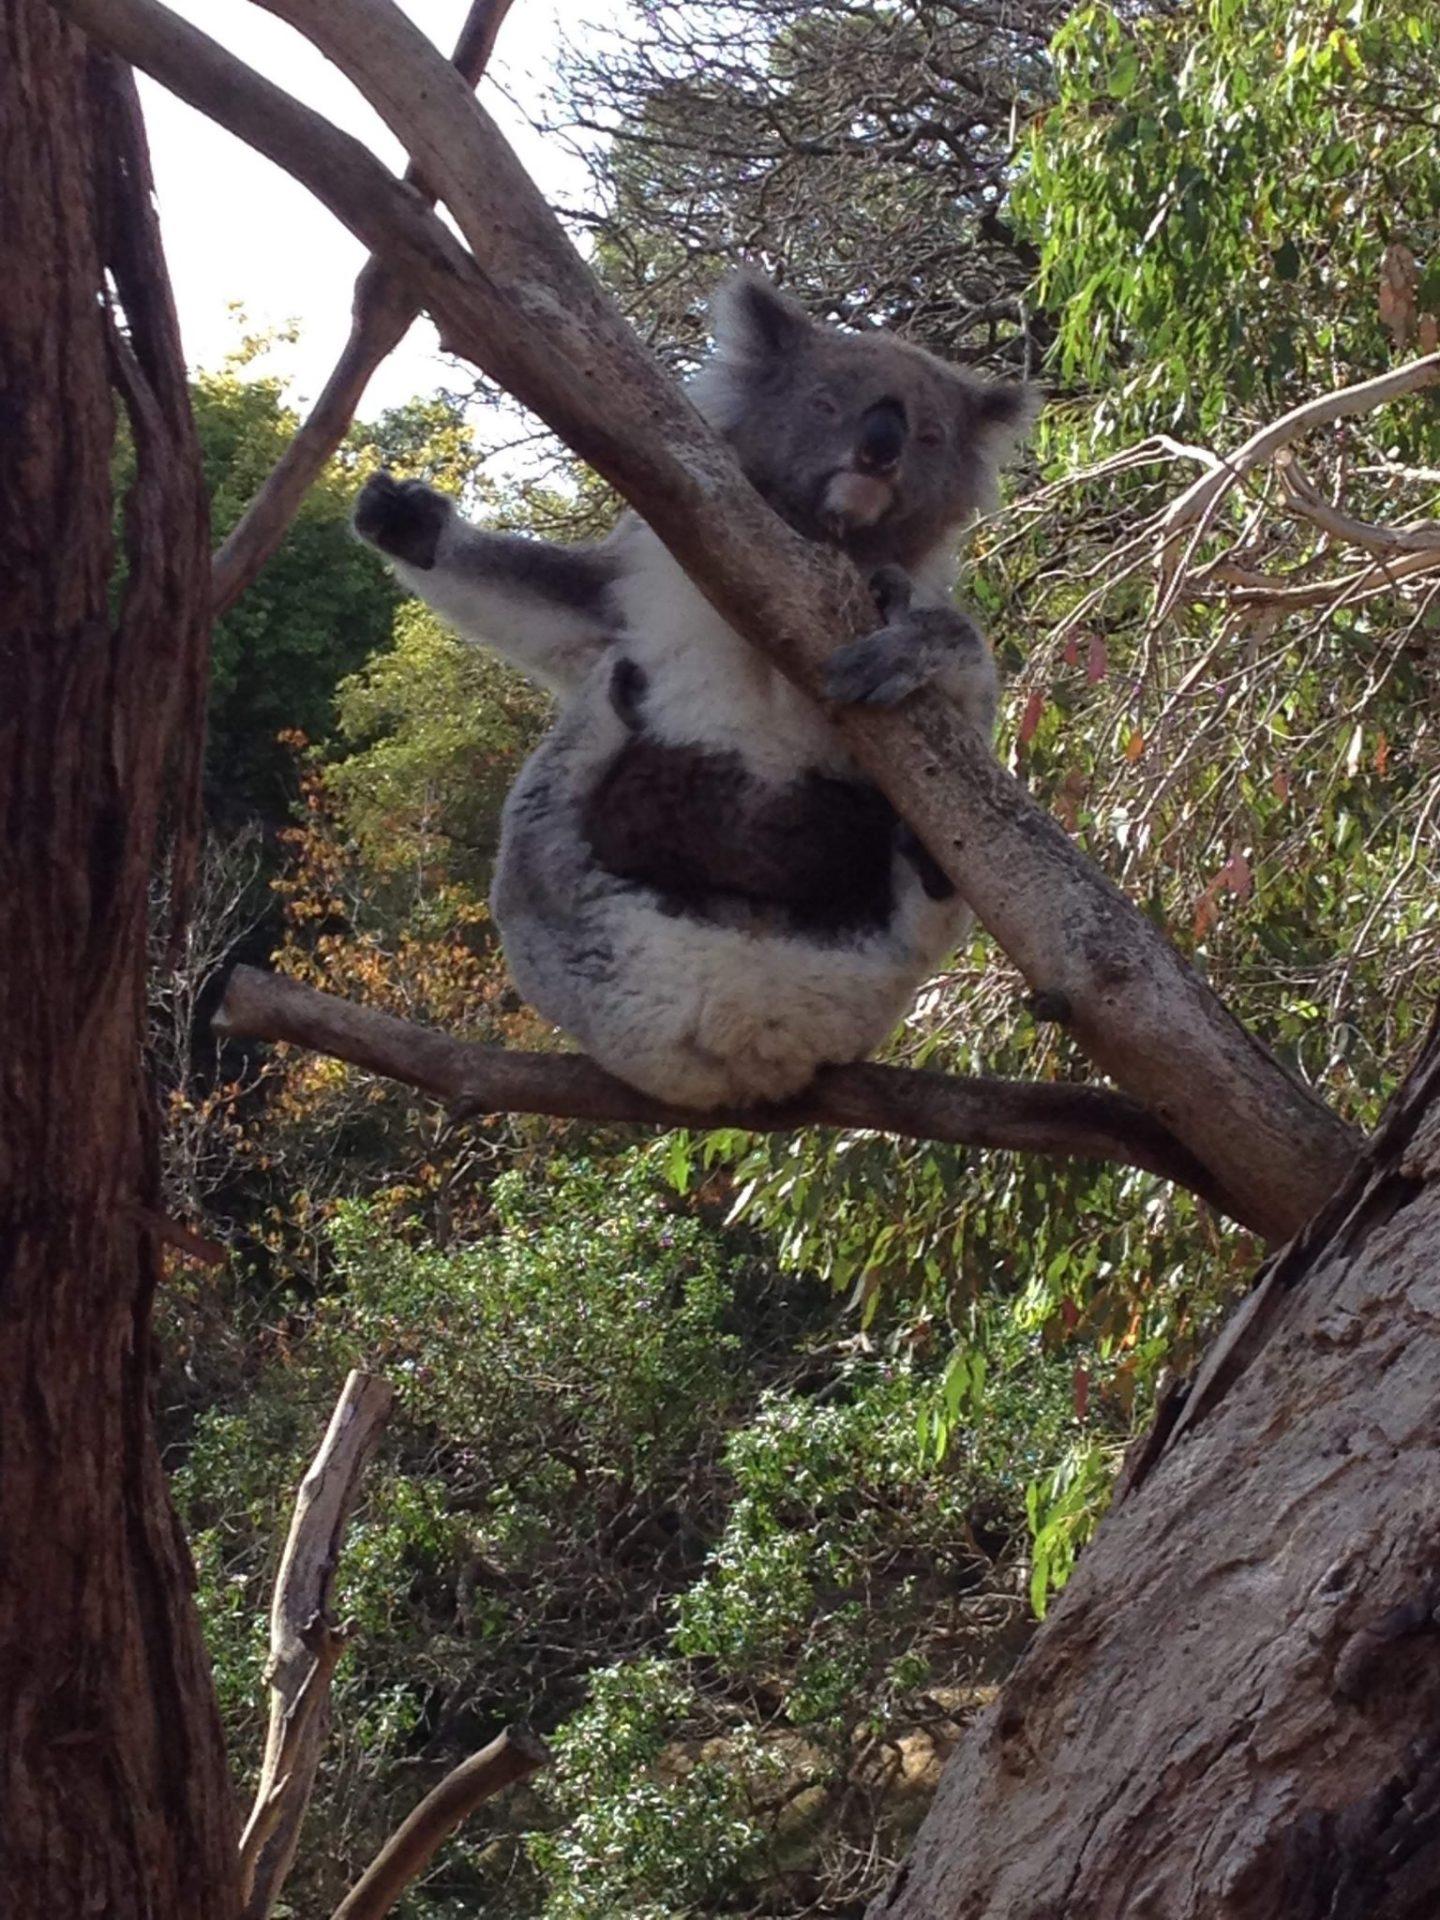 A koala at Phillip Island Wildlife Park